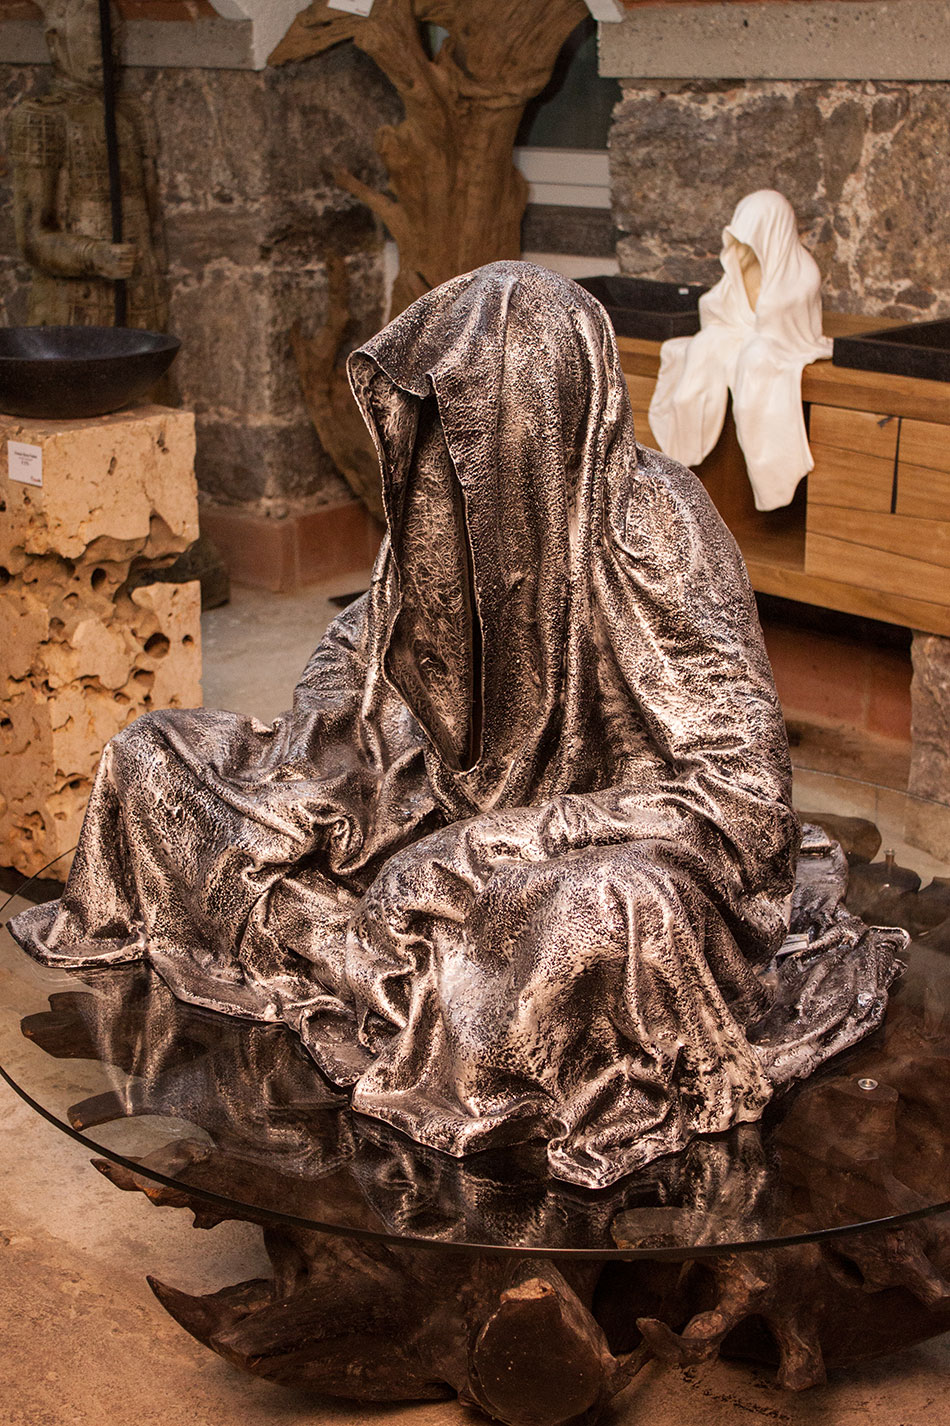 mobile-galerie-gall-toko06-linz-25er-turm-guardians-of-time-manfred-kielnhofer-contemporary-fine-art-design-sculpture-2655